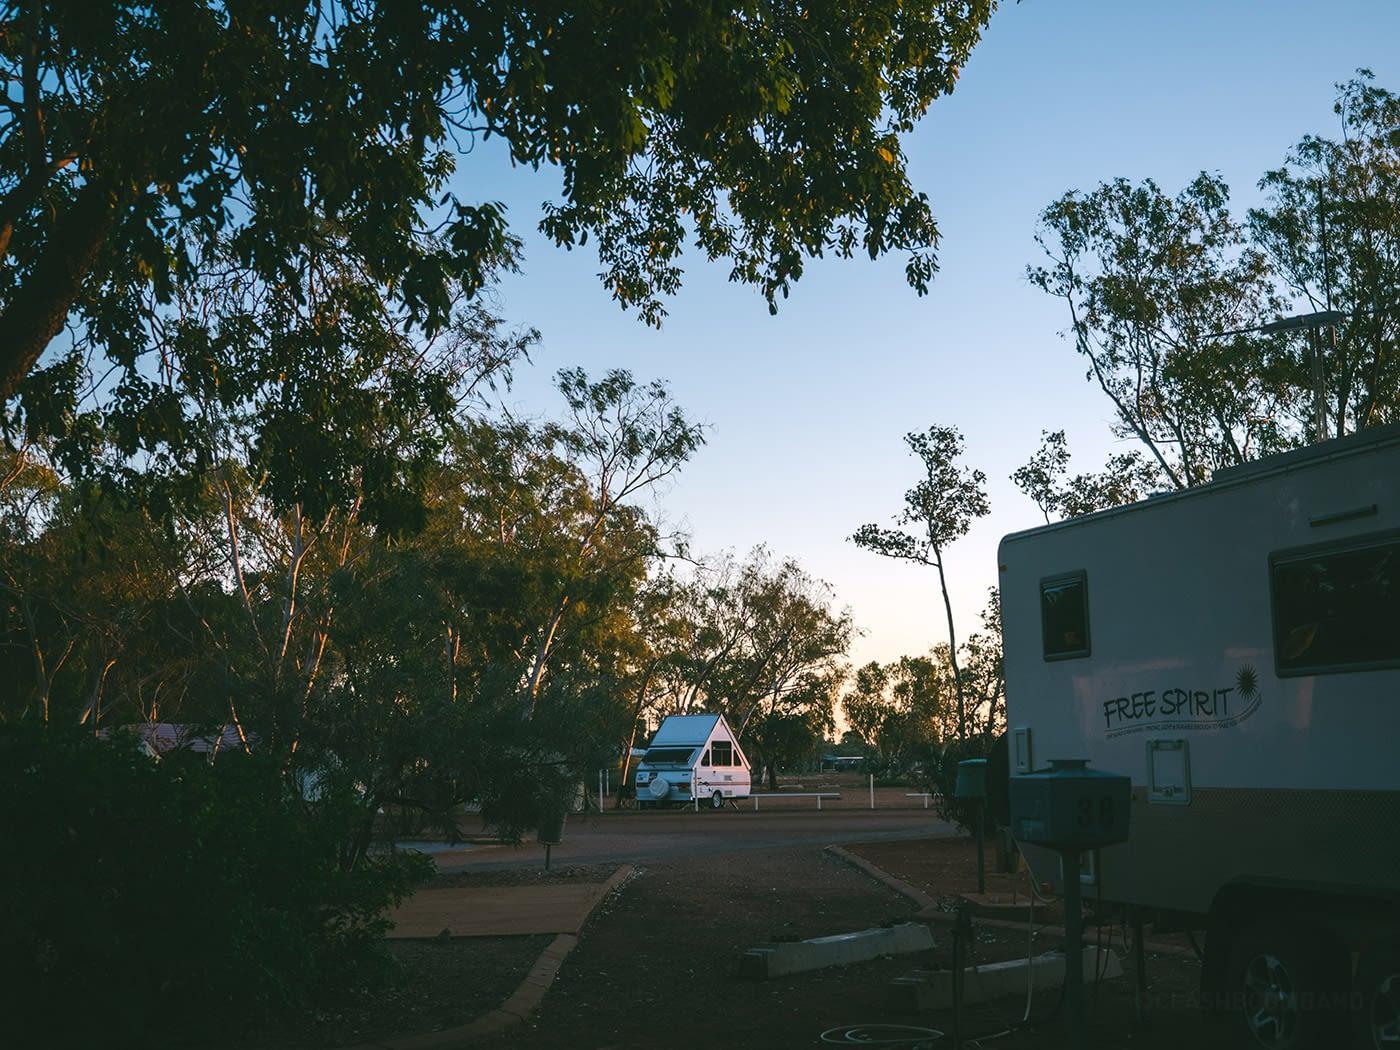 NT Australia - Tennant Creek - Triangle campervan